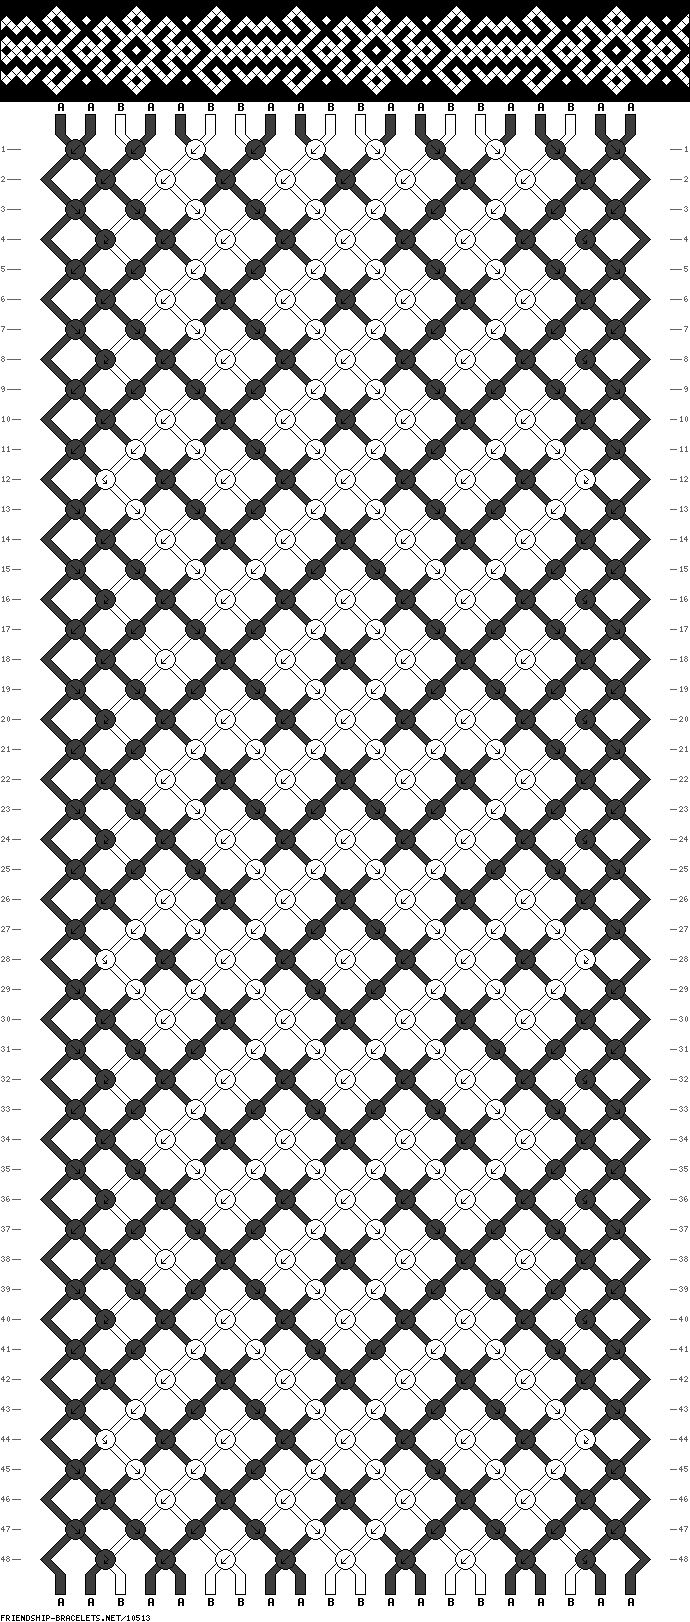 20 strings 48 rows 2 colors